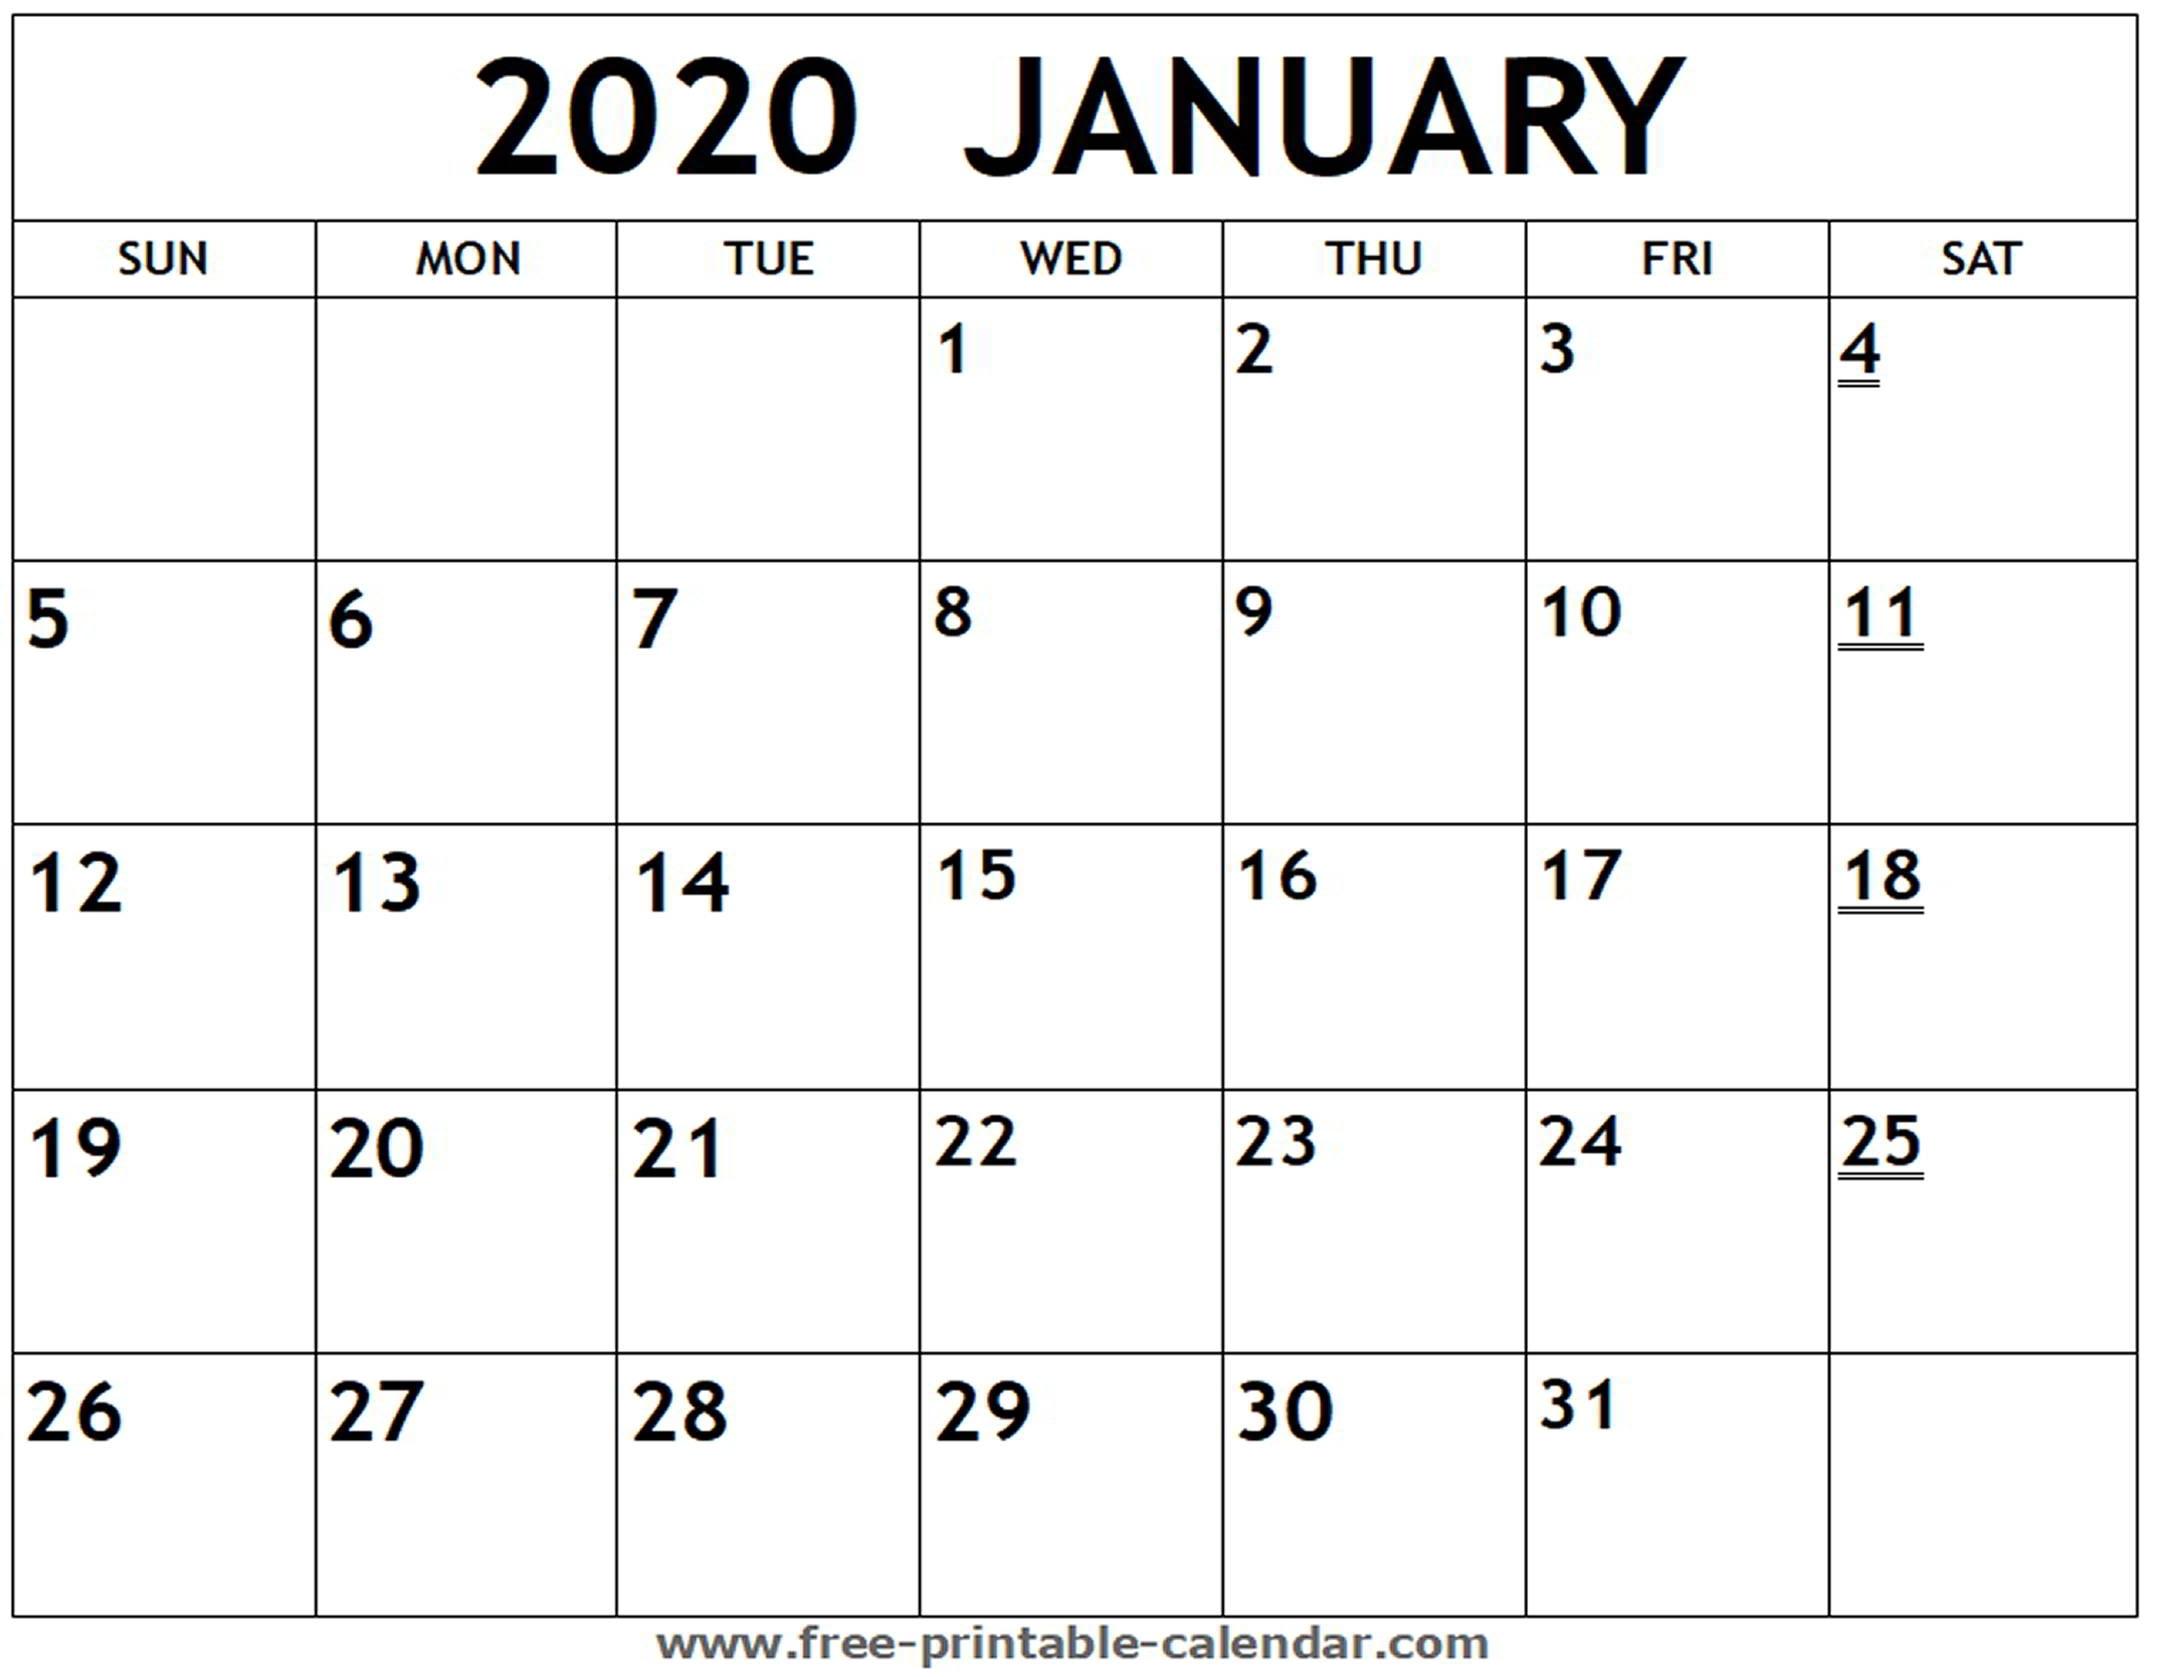 Printable 2020 January Calendar - Free-Printable-Calendar